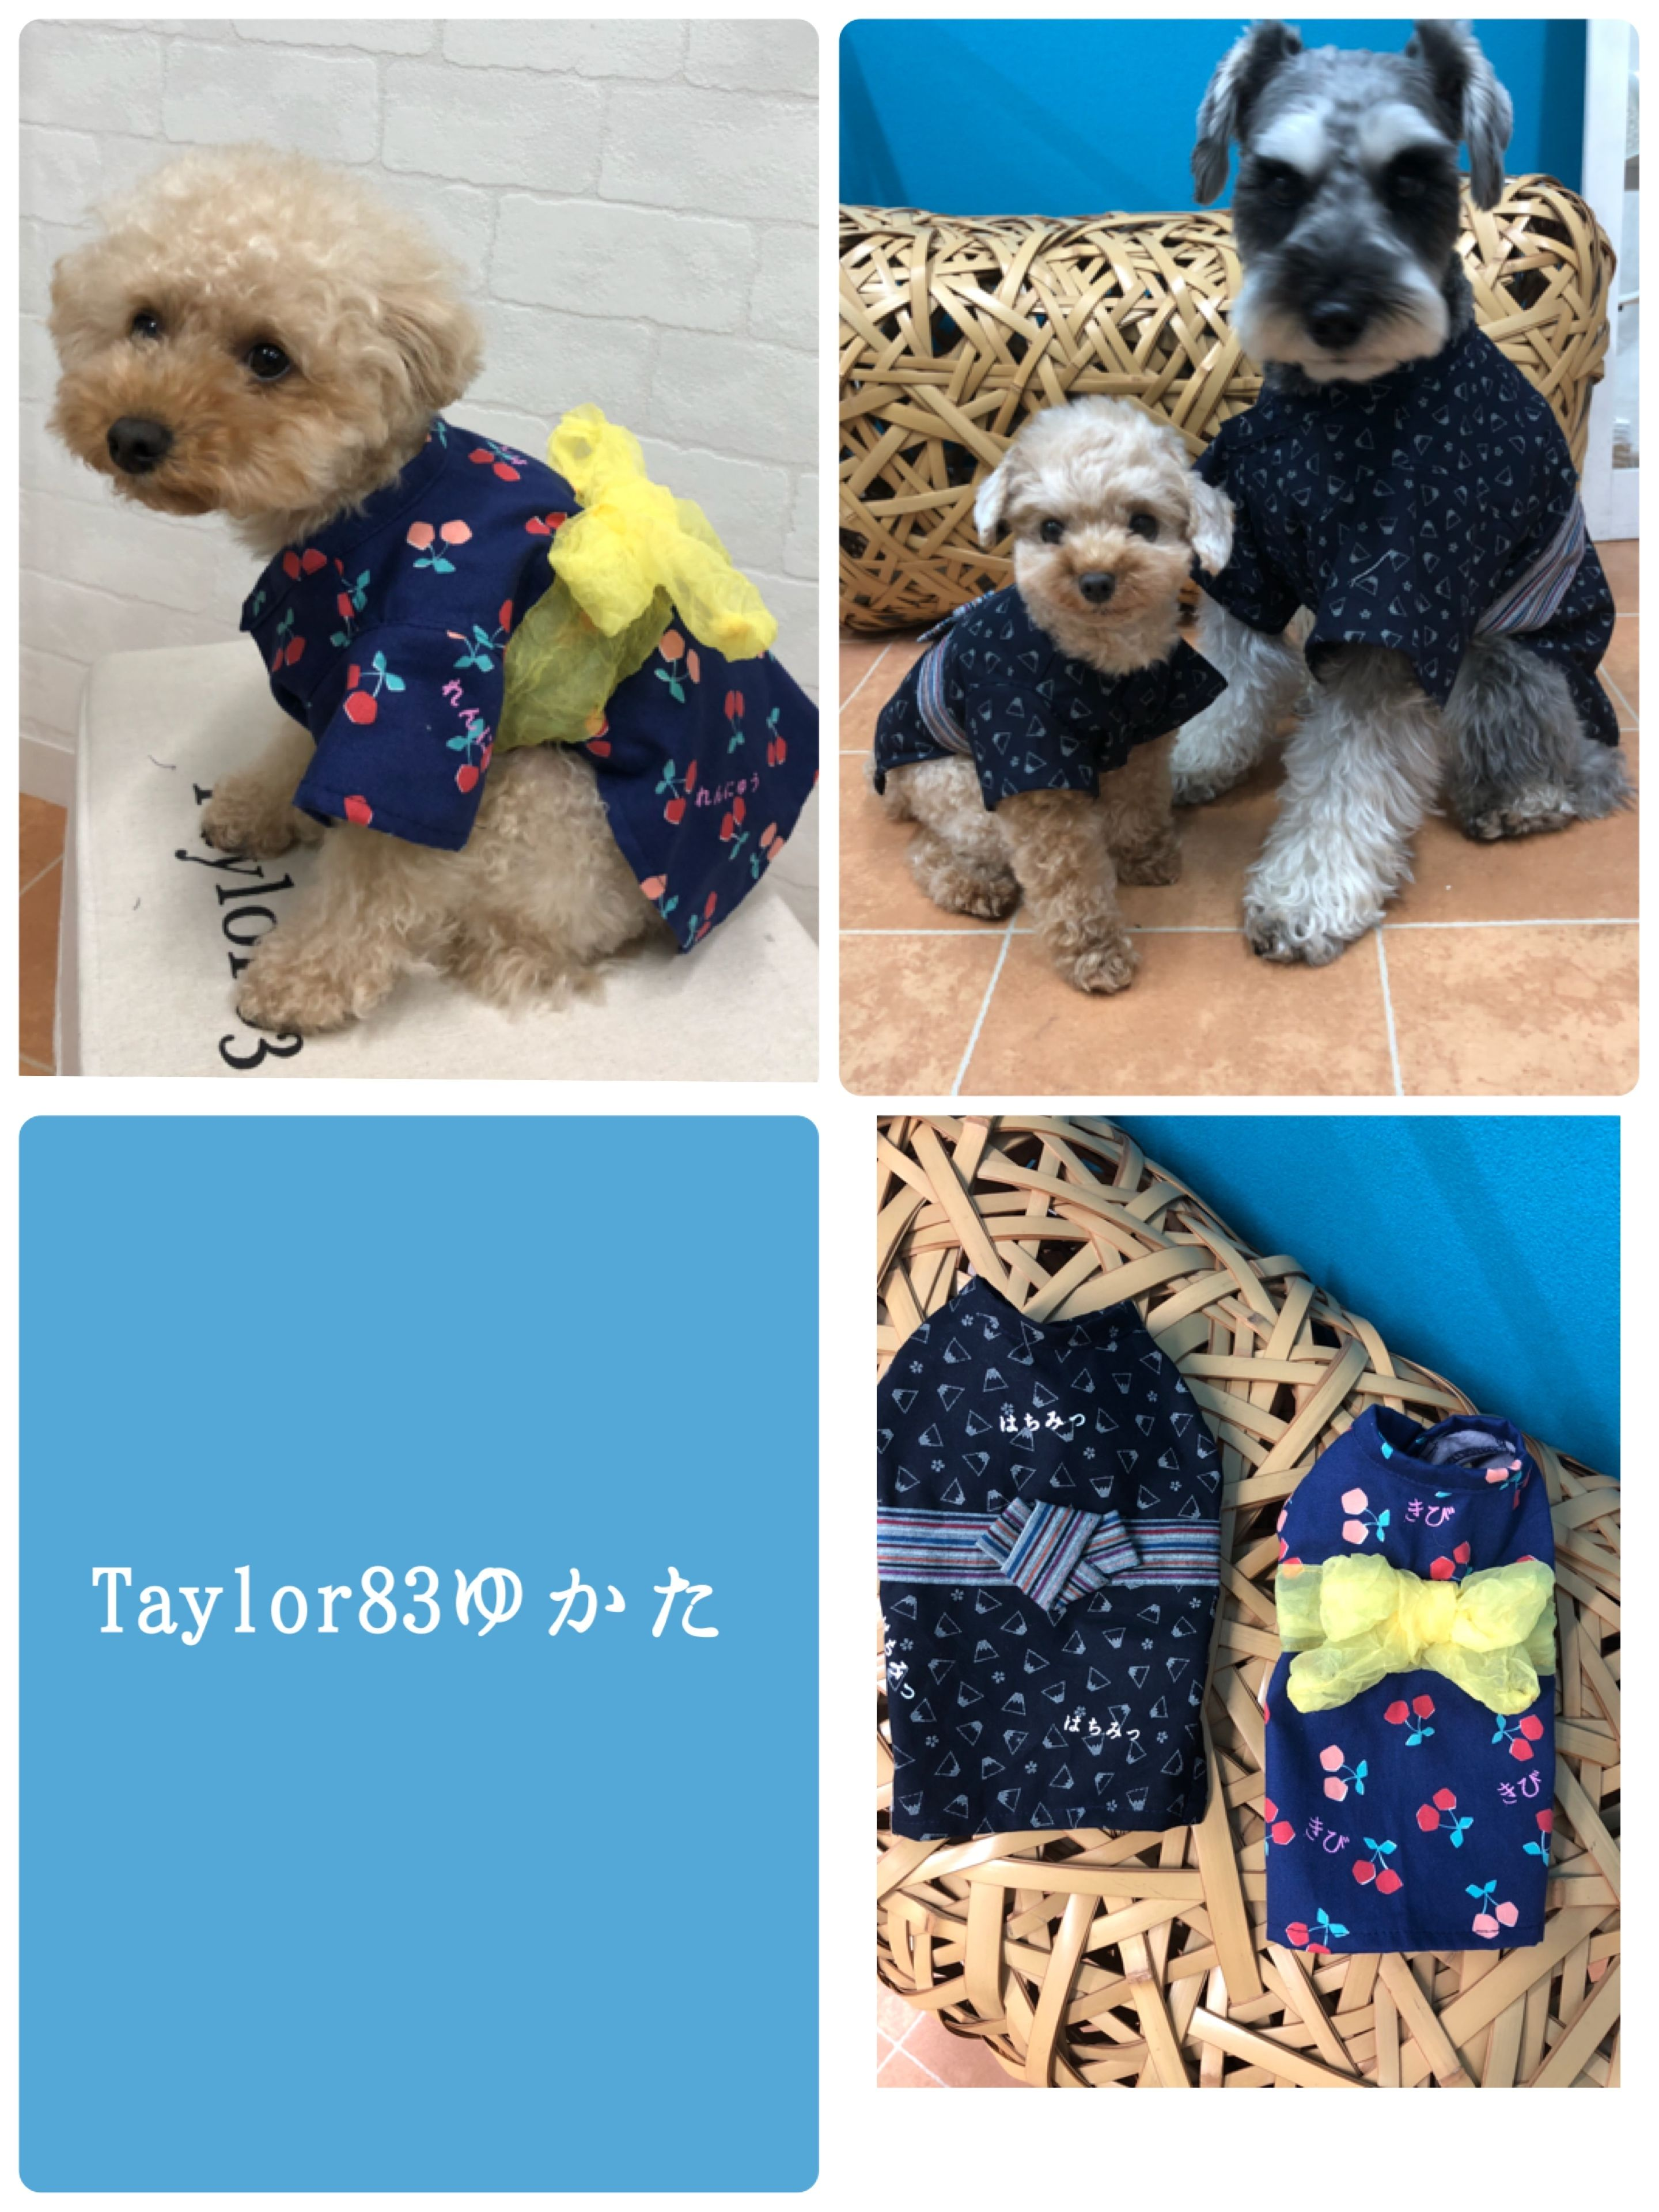 Taylor83ゆかた(うちわ付)  富士山&さくらんぼ